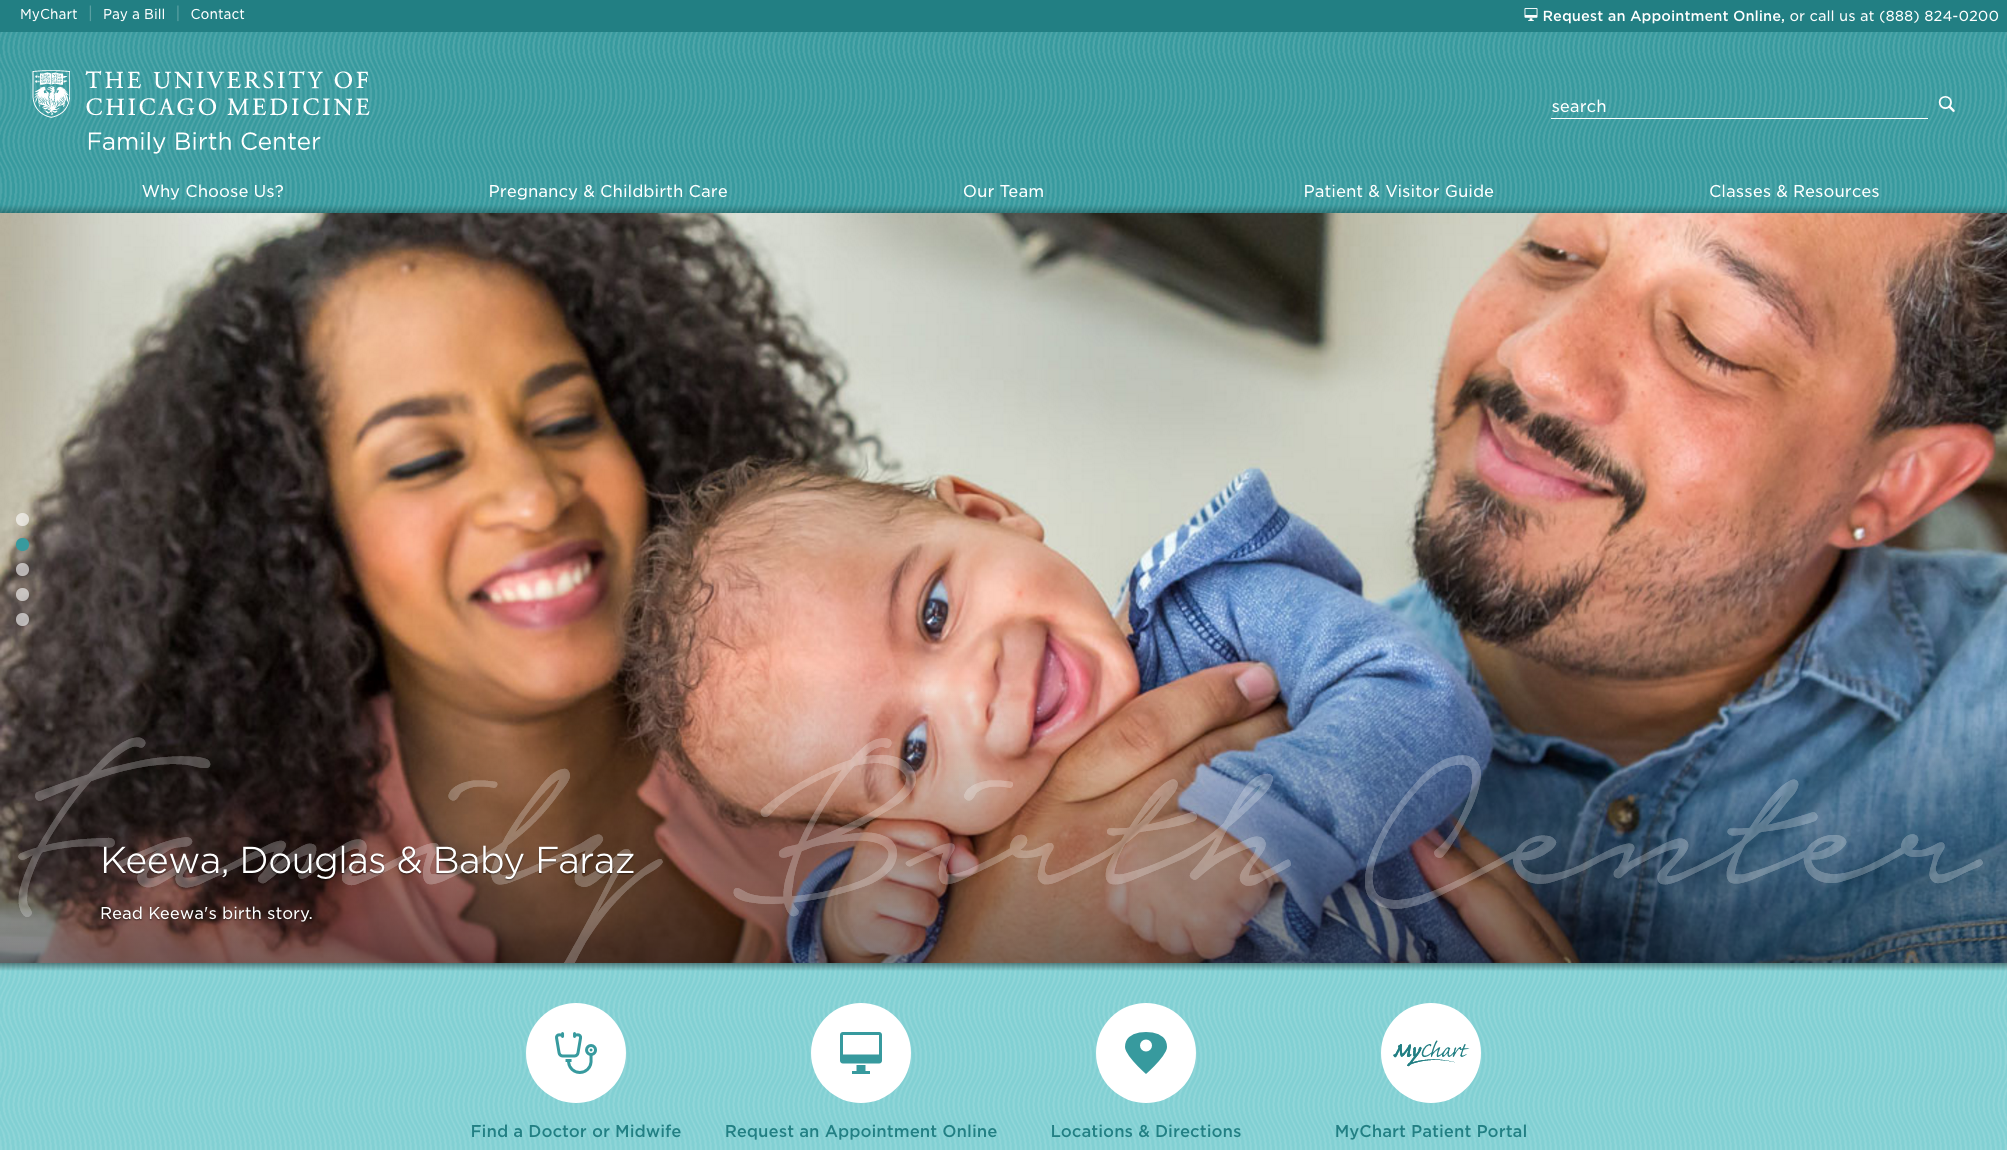 Family_Birth_Center_header